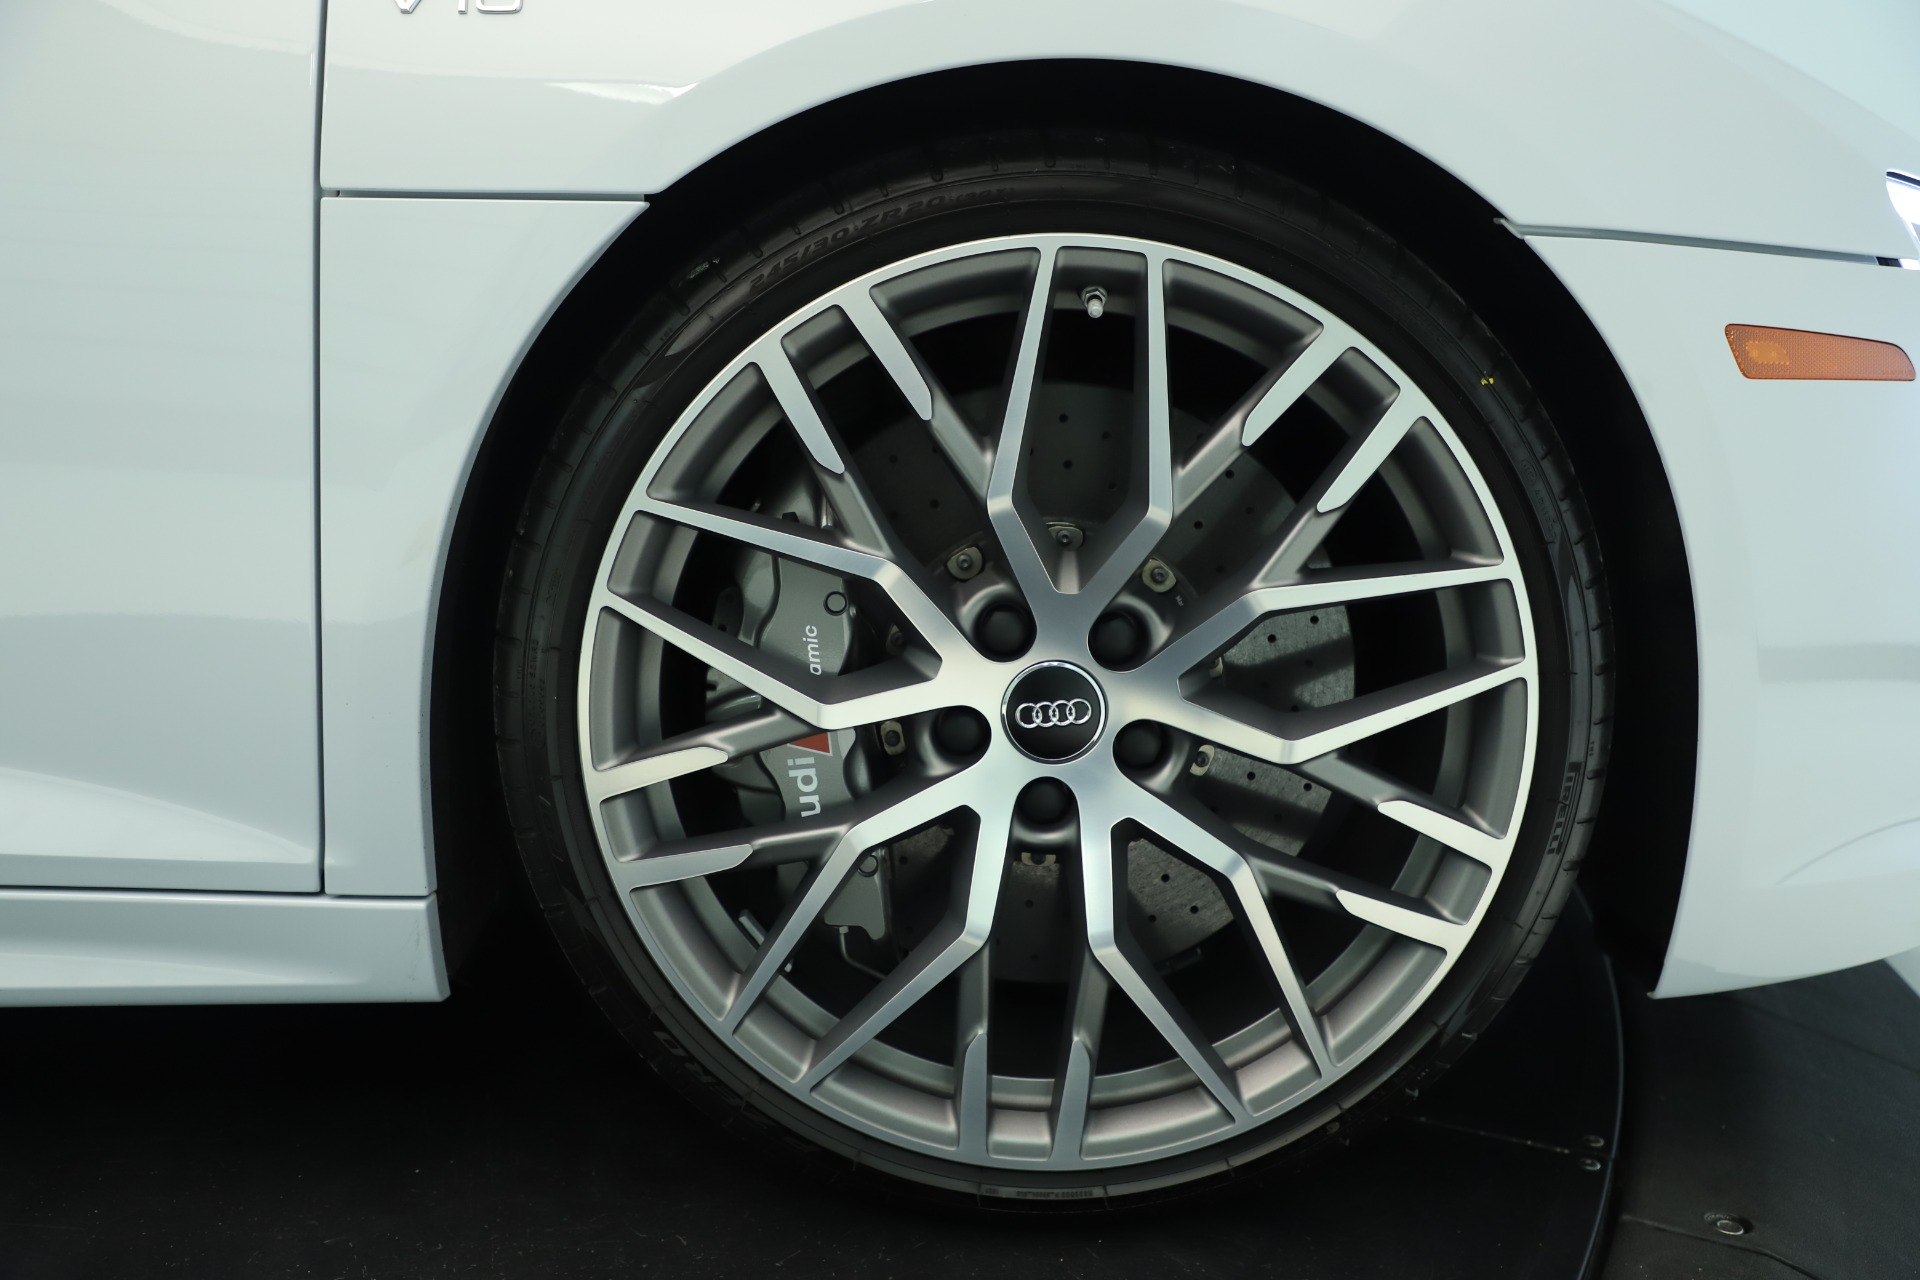 Used 2018 Audi R8 5.2 quattro V10 Plus For Sale In Greenwich, CT 3360_p13